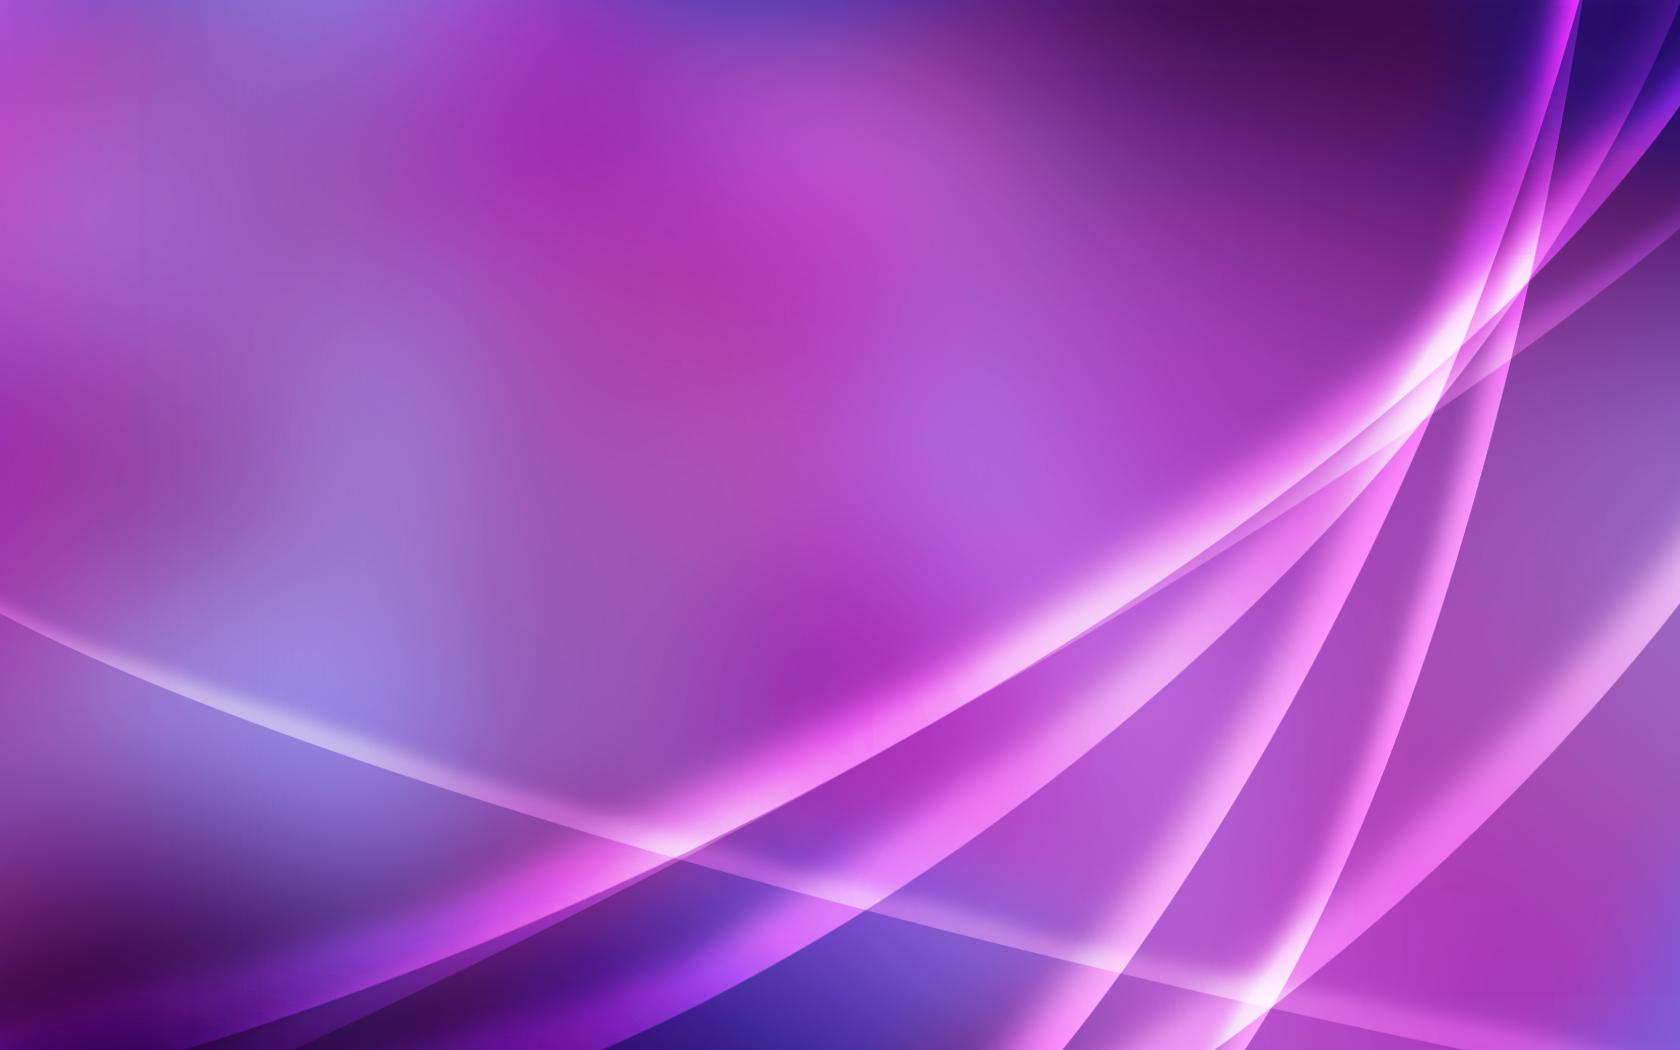 Wallpaper Hd Light Effect Wallpaper: Cool Purple Wallpaper